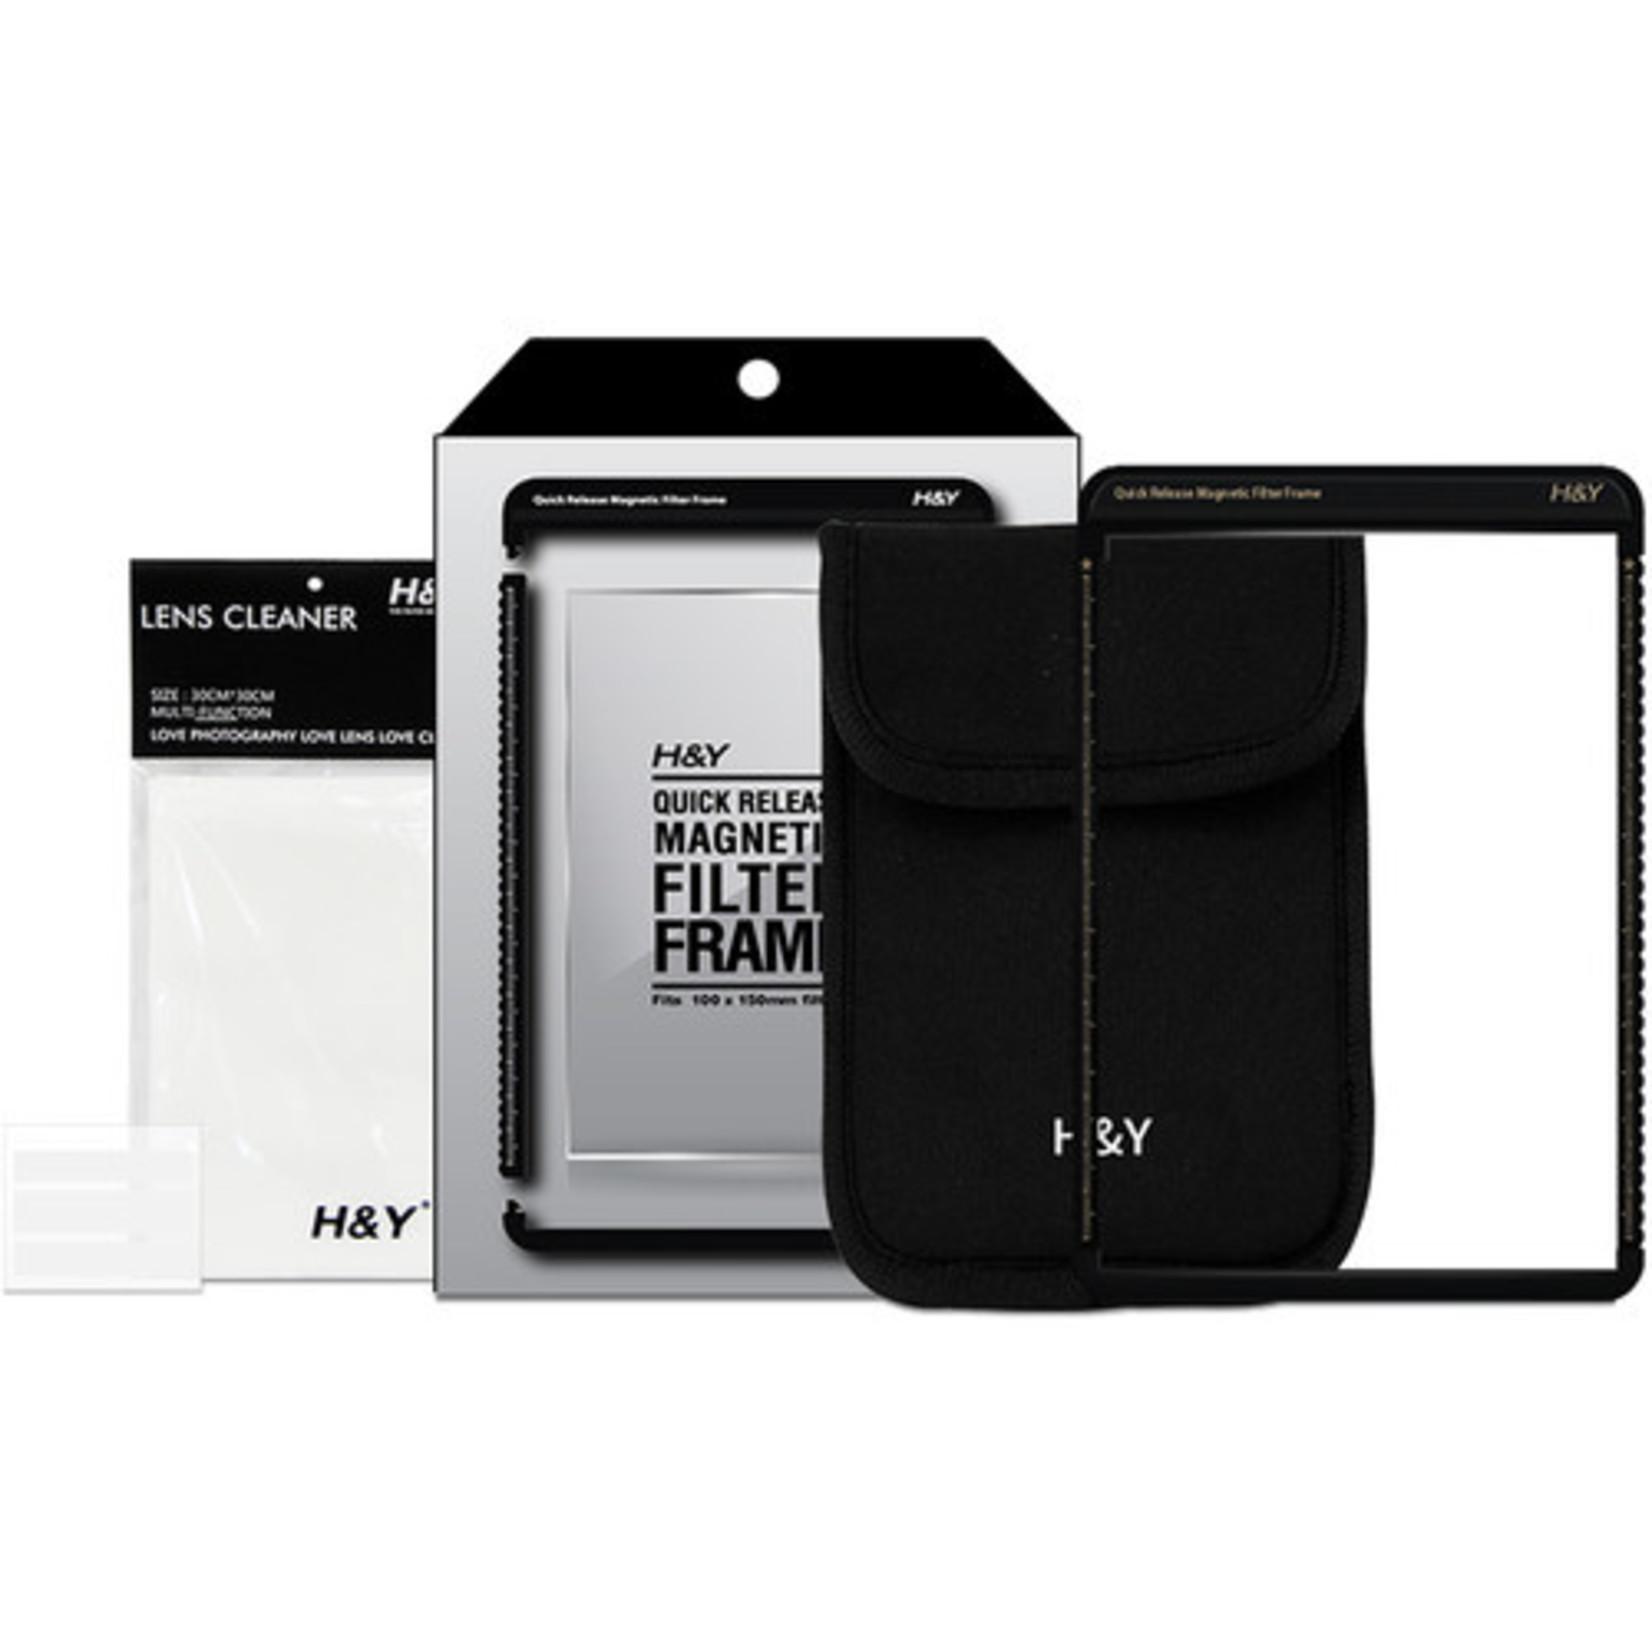 H&Y 100mm x 150mm Magnetic Filter Frame square